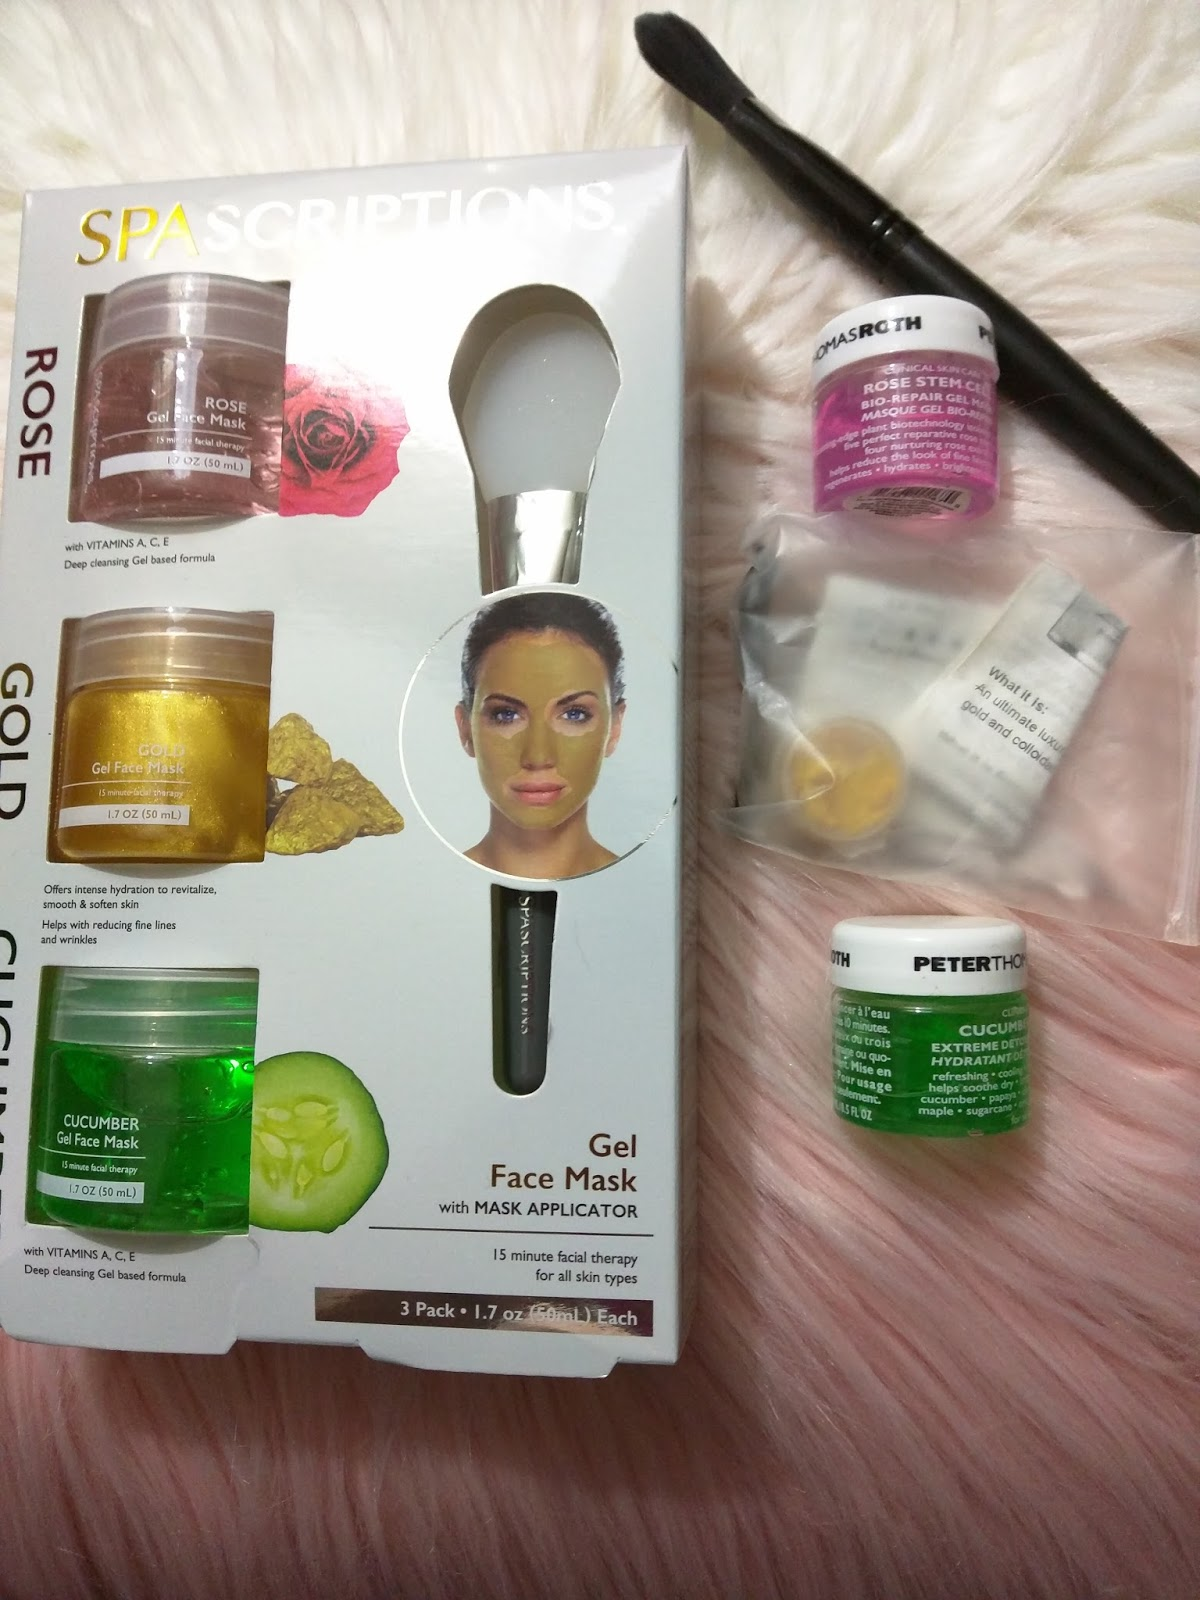 Image result for SPAscriptions ROSE, GOLD, CUCUMBER Gel Face Mask with Mask Applicator